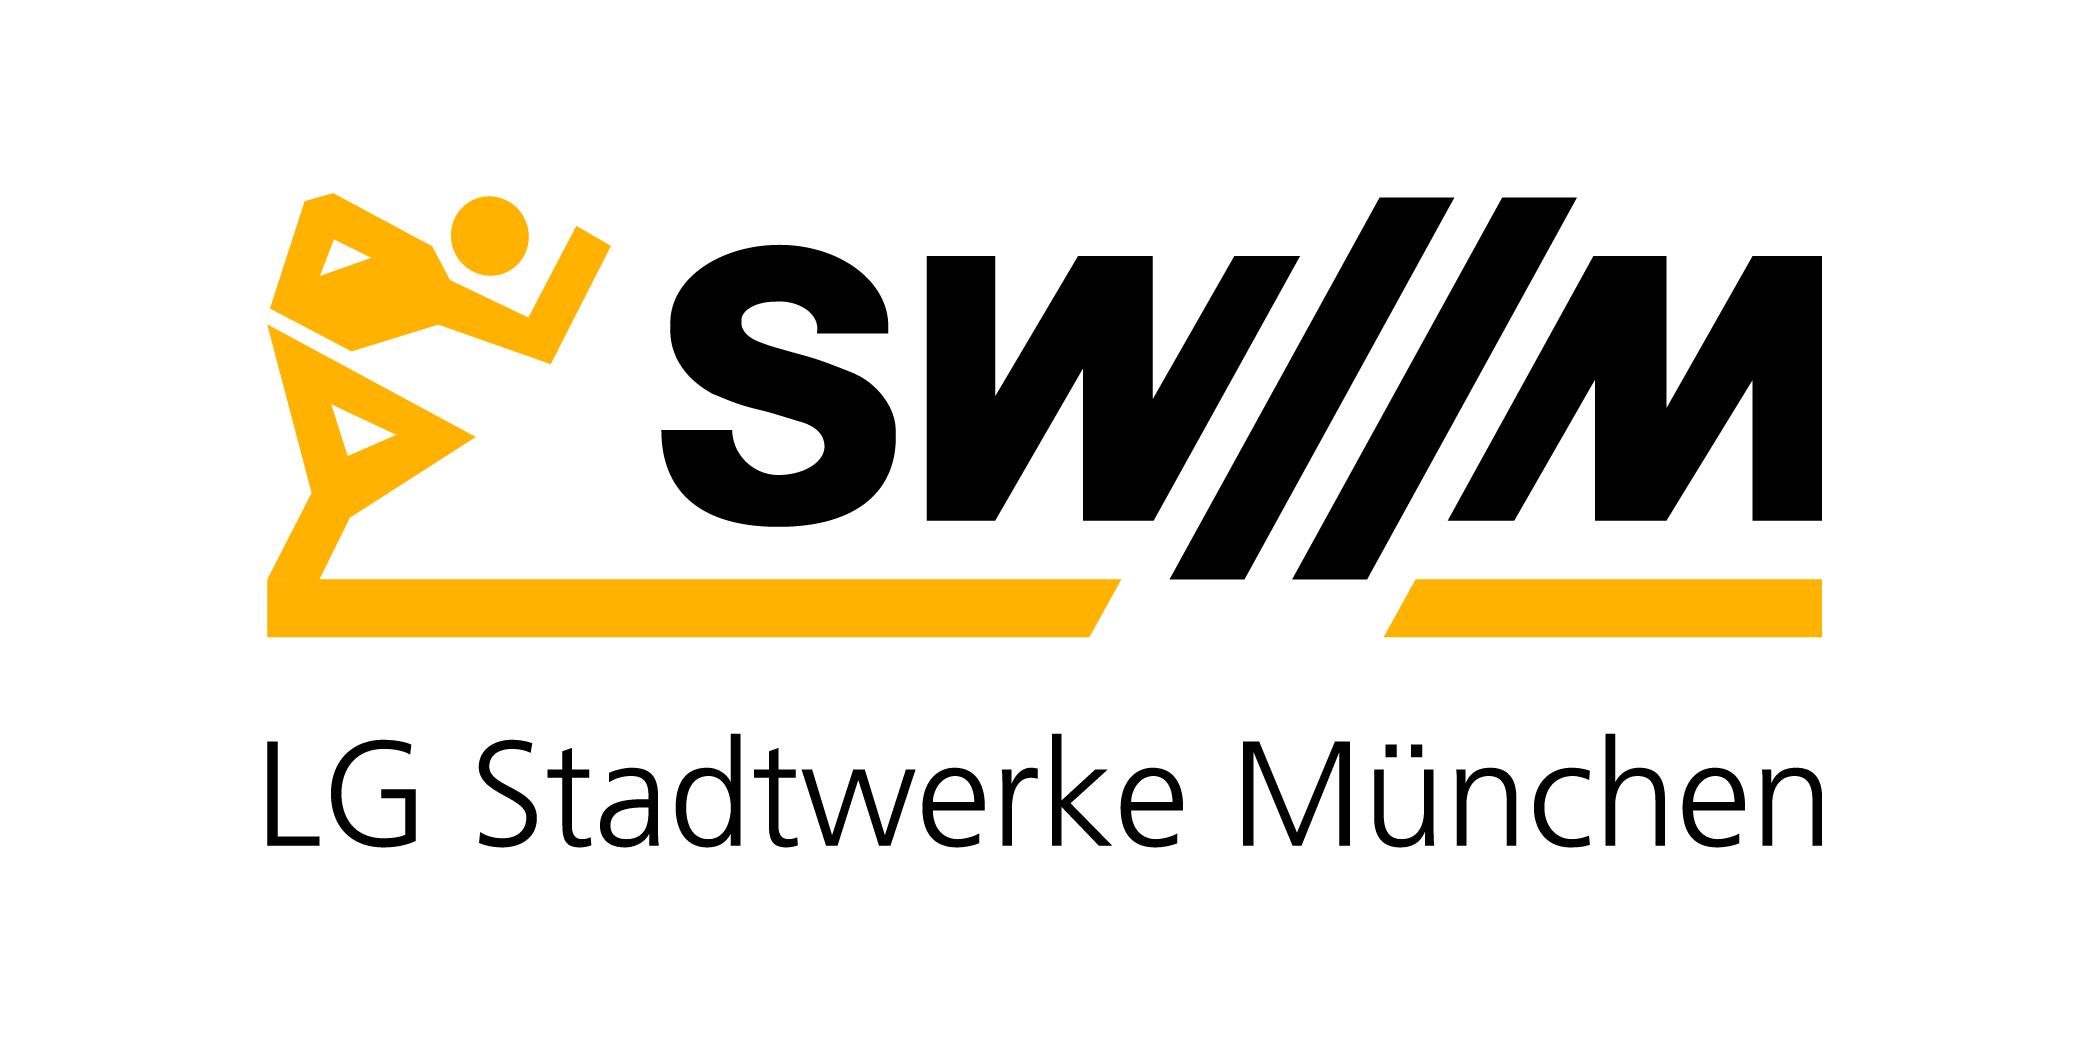 LG SWM